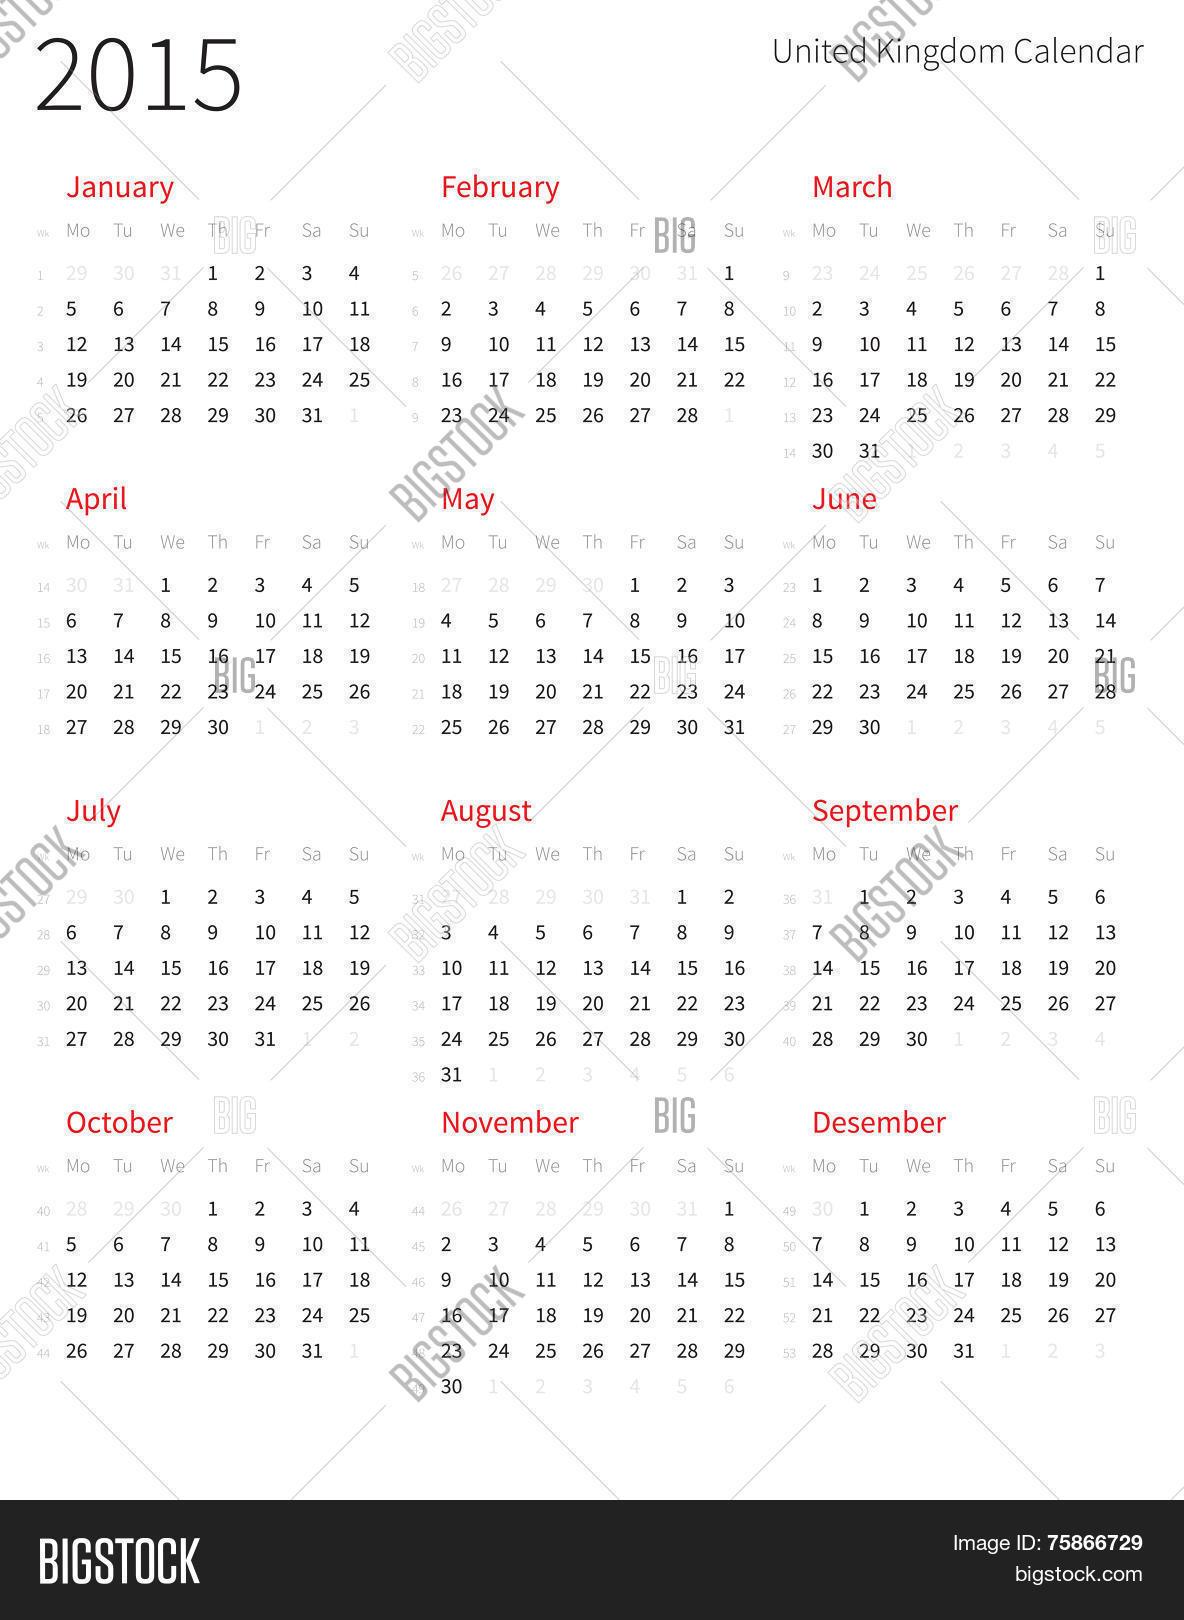 Year Calendar With Week Numbers : United kingdom year calendar vector photo bigstock